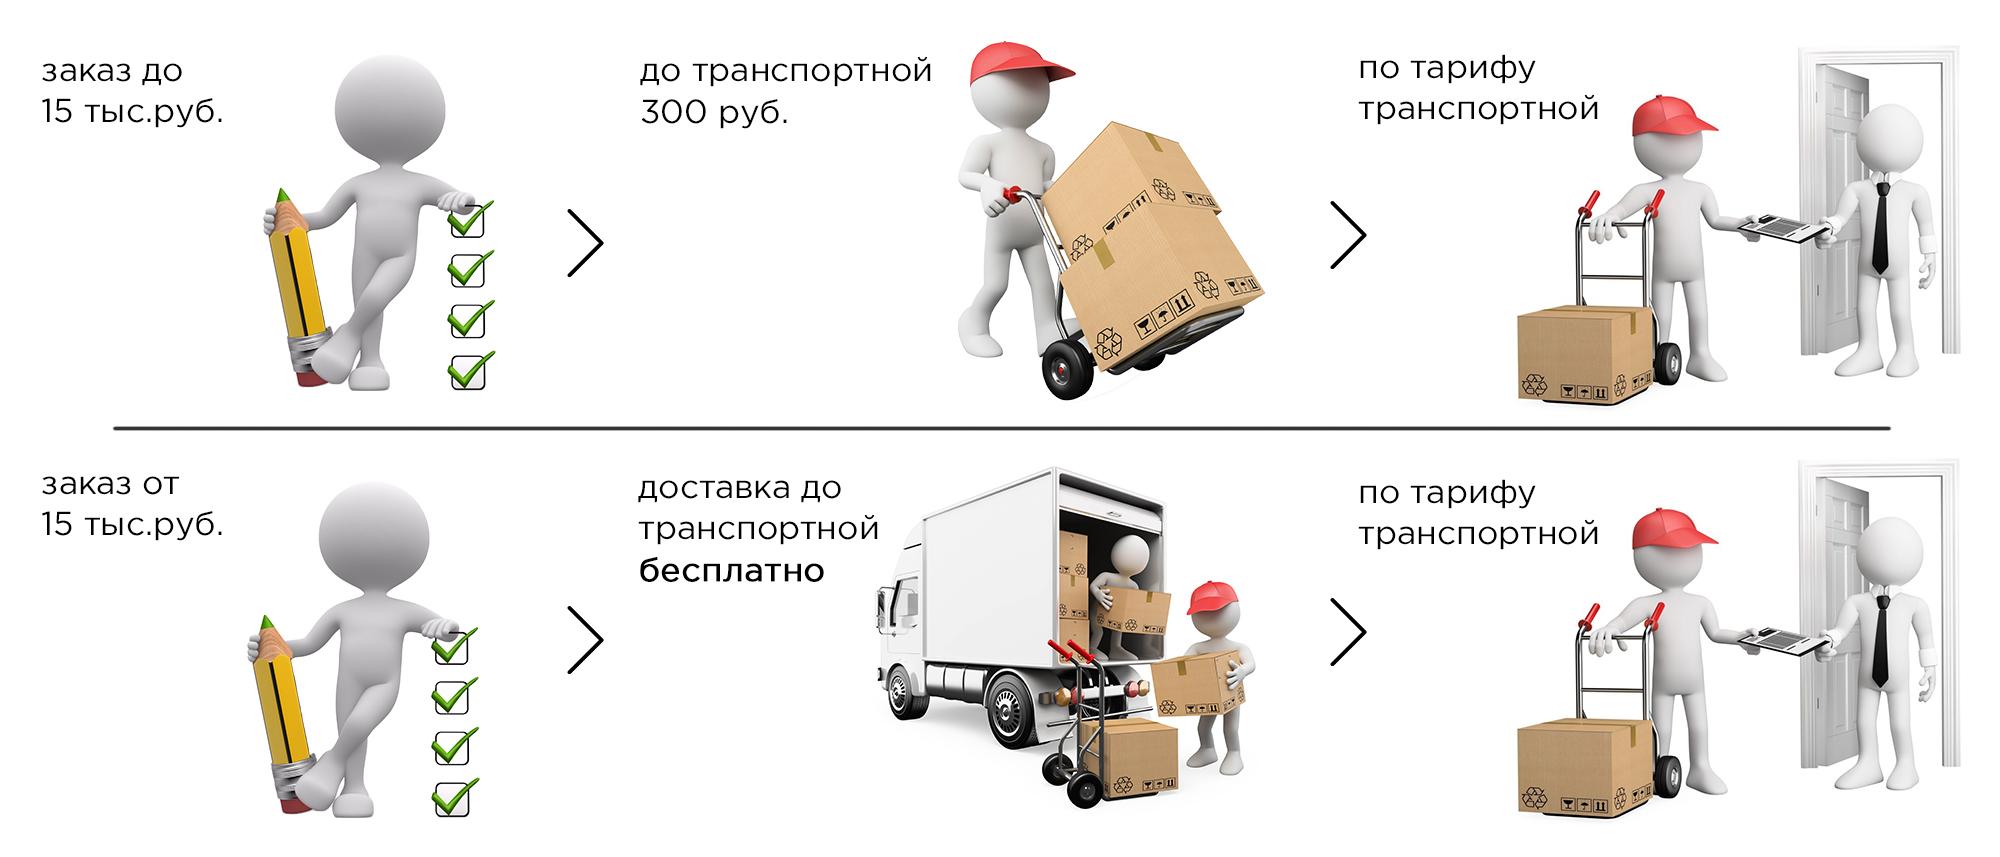 79ab5efdb23 Доставка и оплата. Схема отправки товара Схема отправки товара